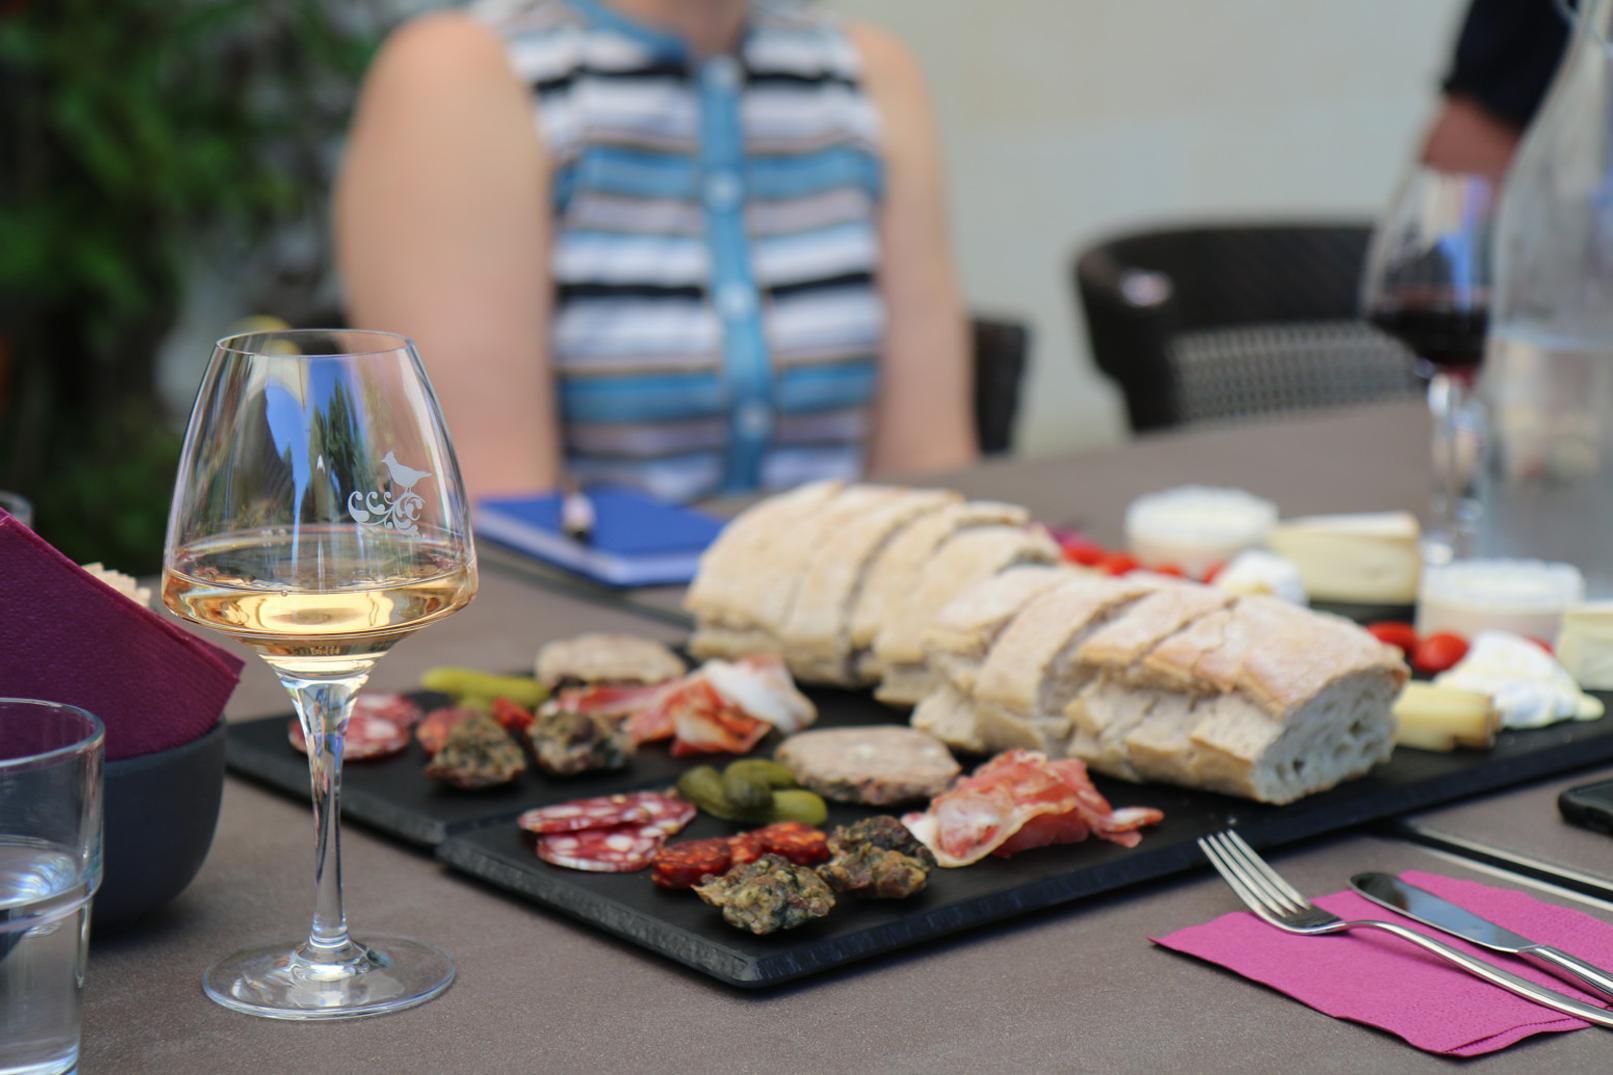 Picnic & meals at the vineyard @ Gillet